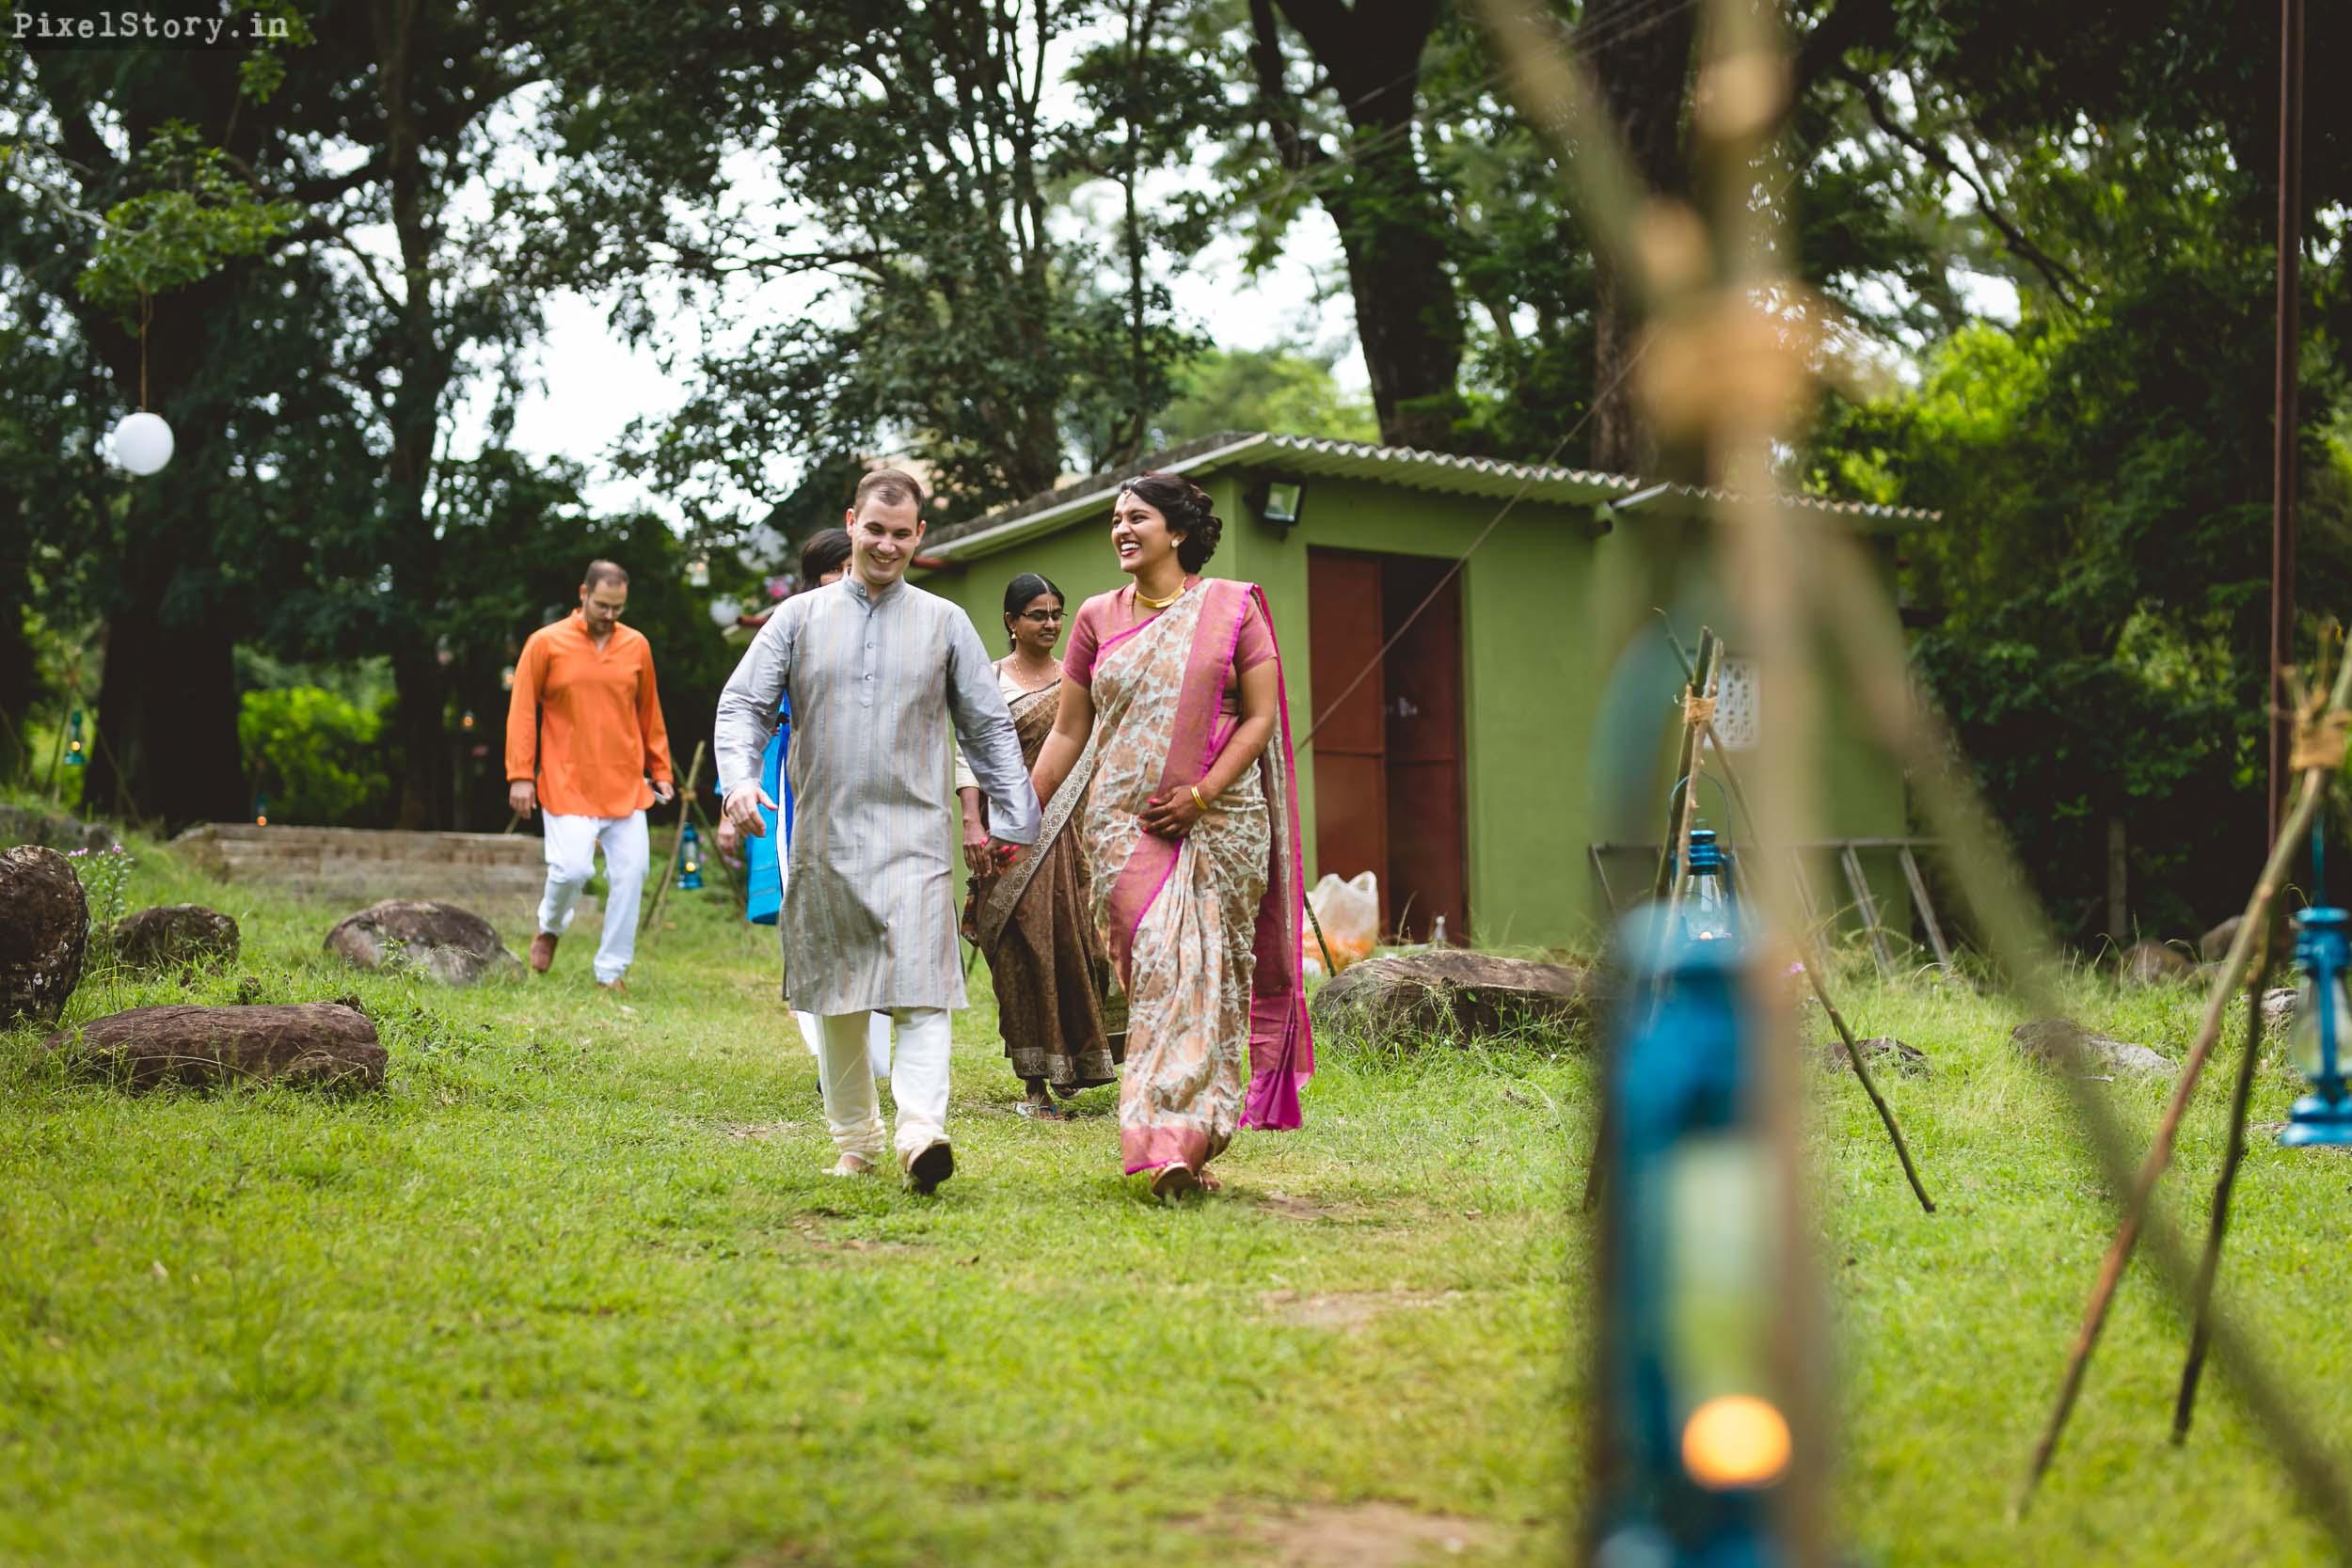 PixelStory-Jungle-Wedding-Photographer-Masinagudi-Indo-French002.jpg